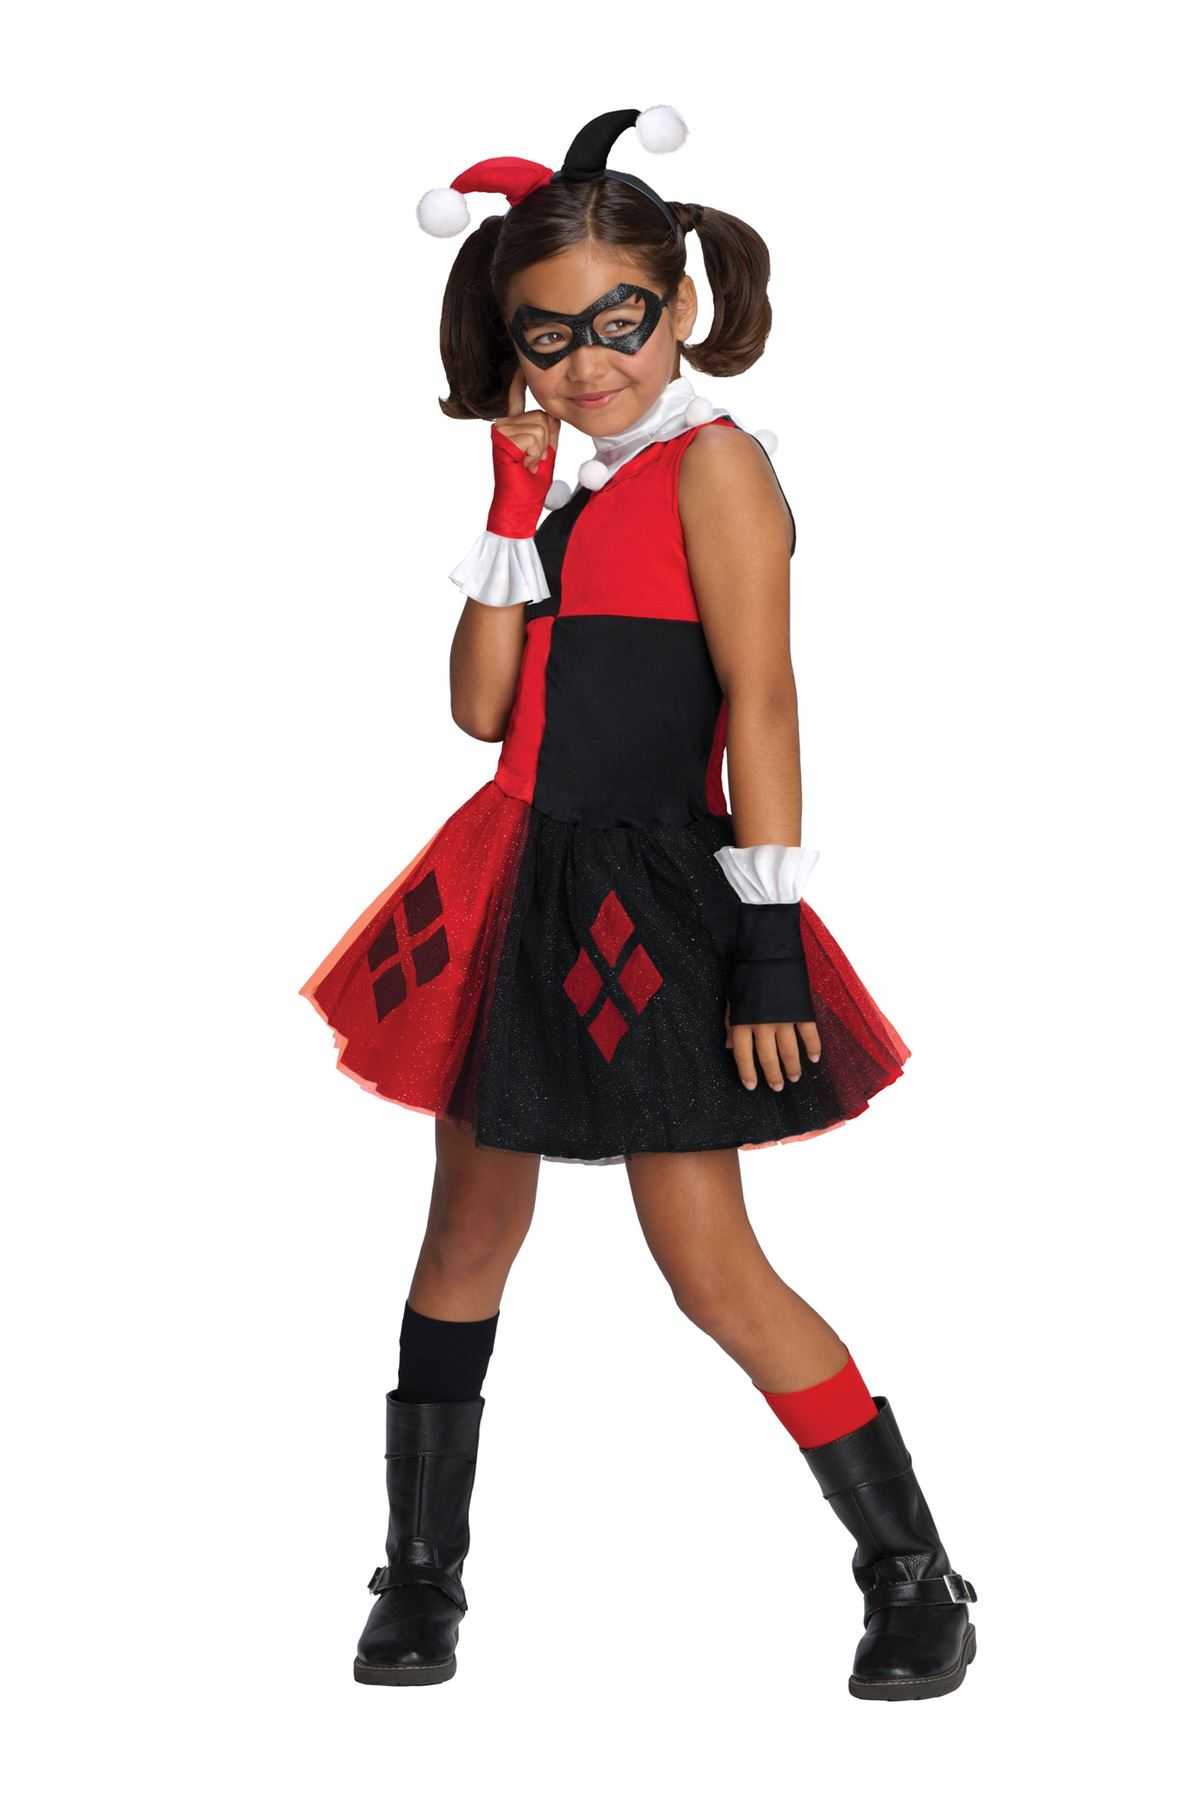 Batman Harley Quinn Tutu Costume Girls Medium by Rubies